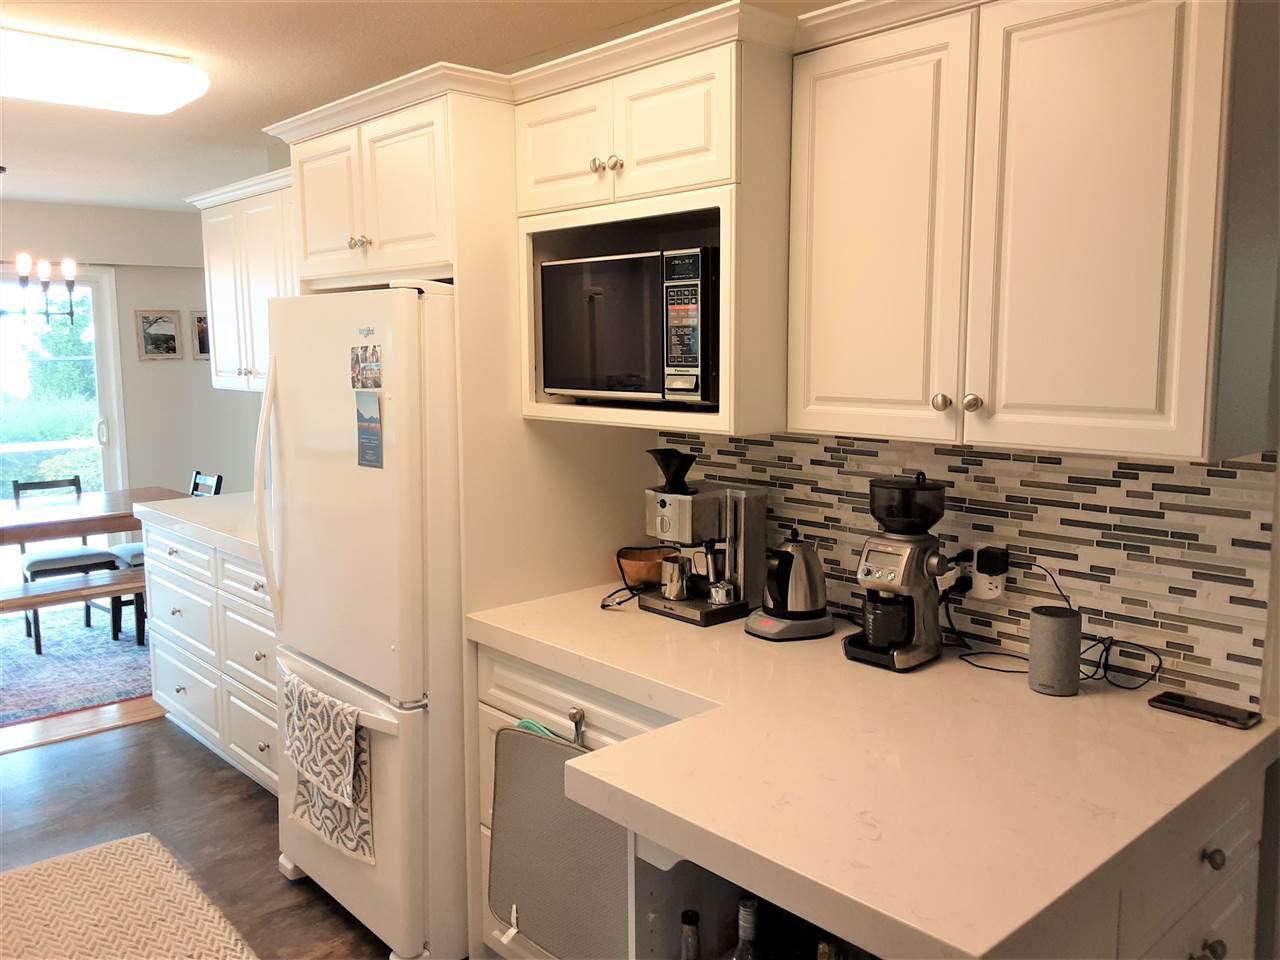 Photo 4: Photos: 15291 COLUMBIA Avenue: White Rock House for sale (South Surrey White Rock)  : MLS®# R2492863